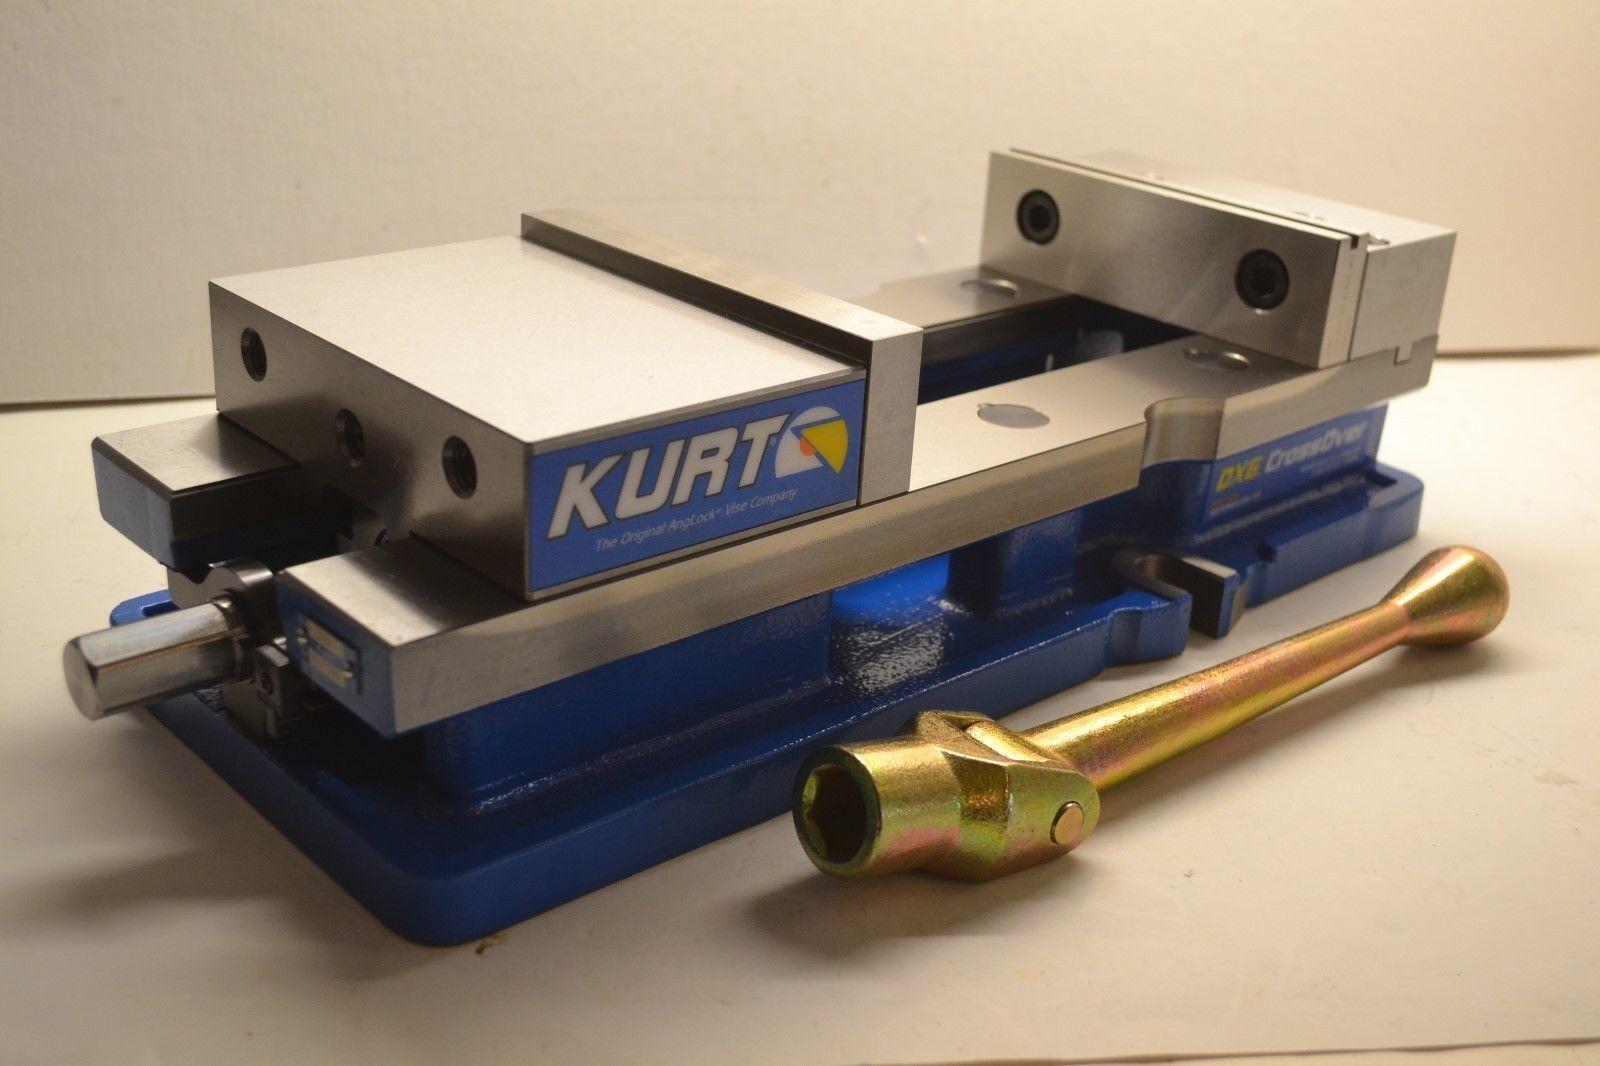 NEW KURT USA DX6 CrossOver 6″ Milling Machine CNC Vise 9″ OPENING cc123